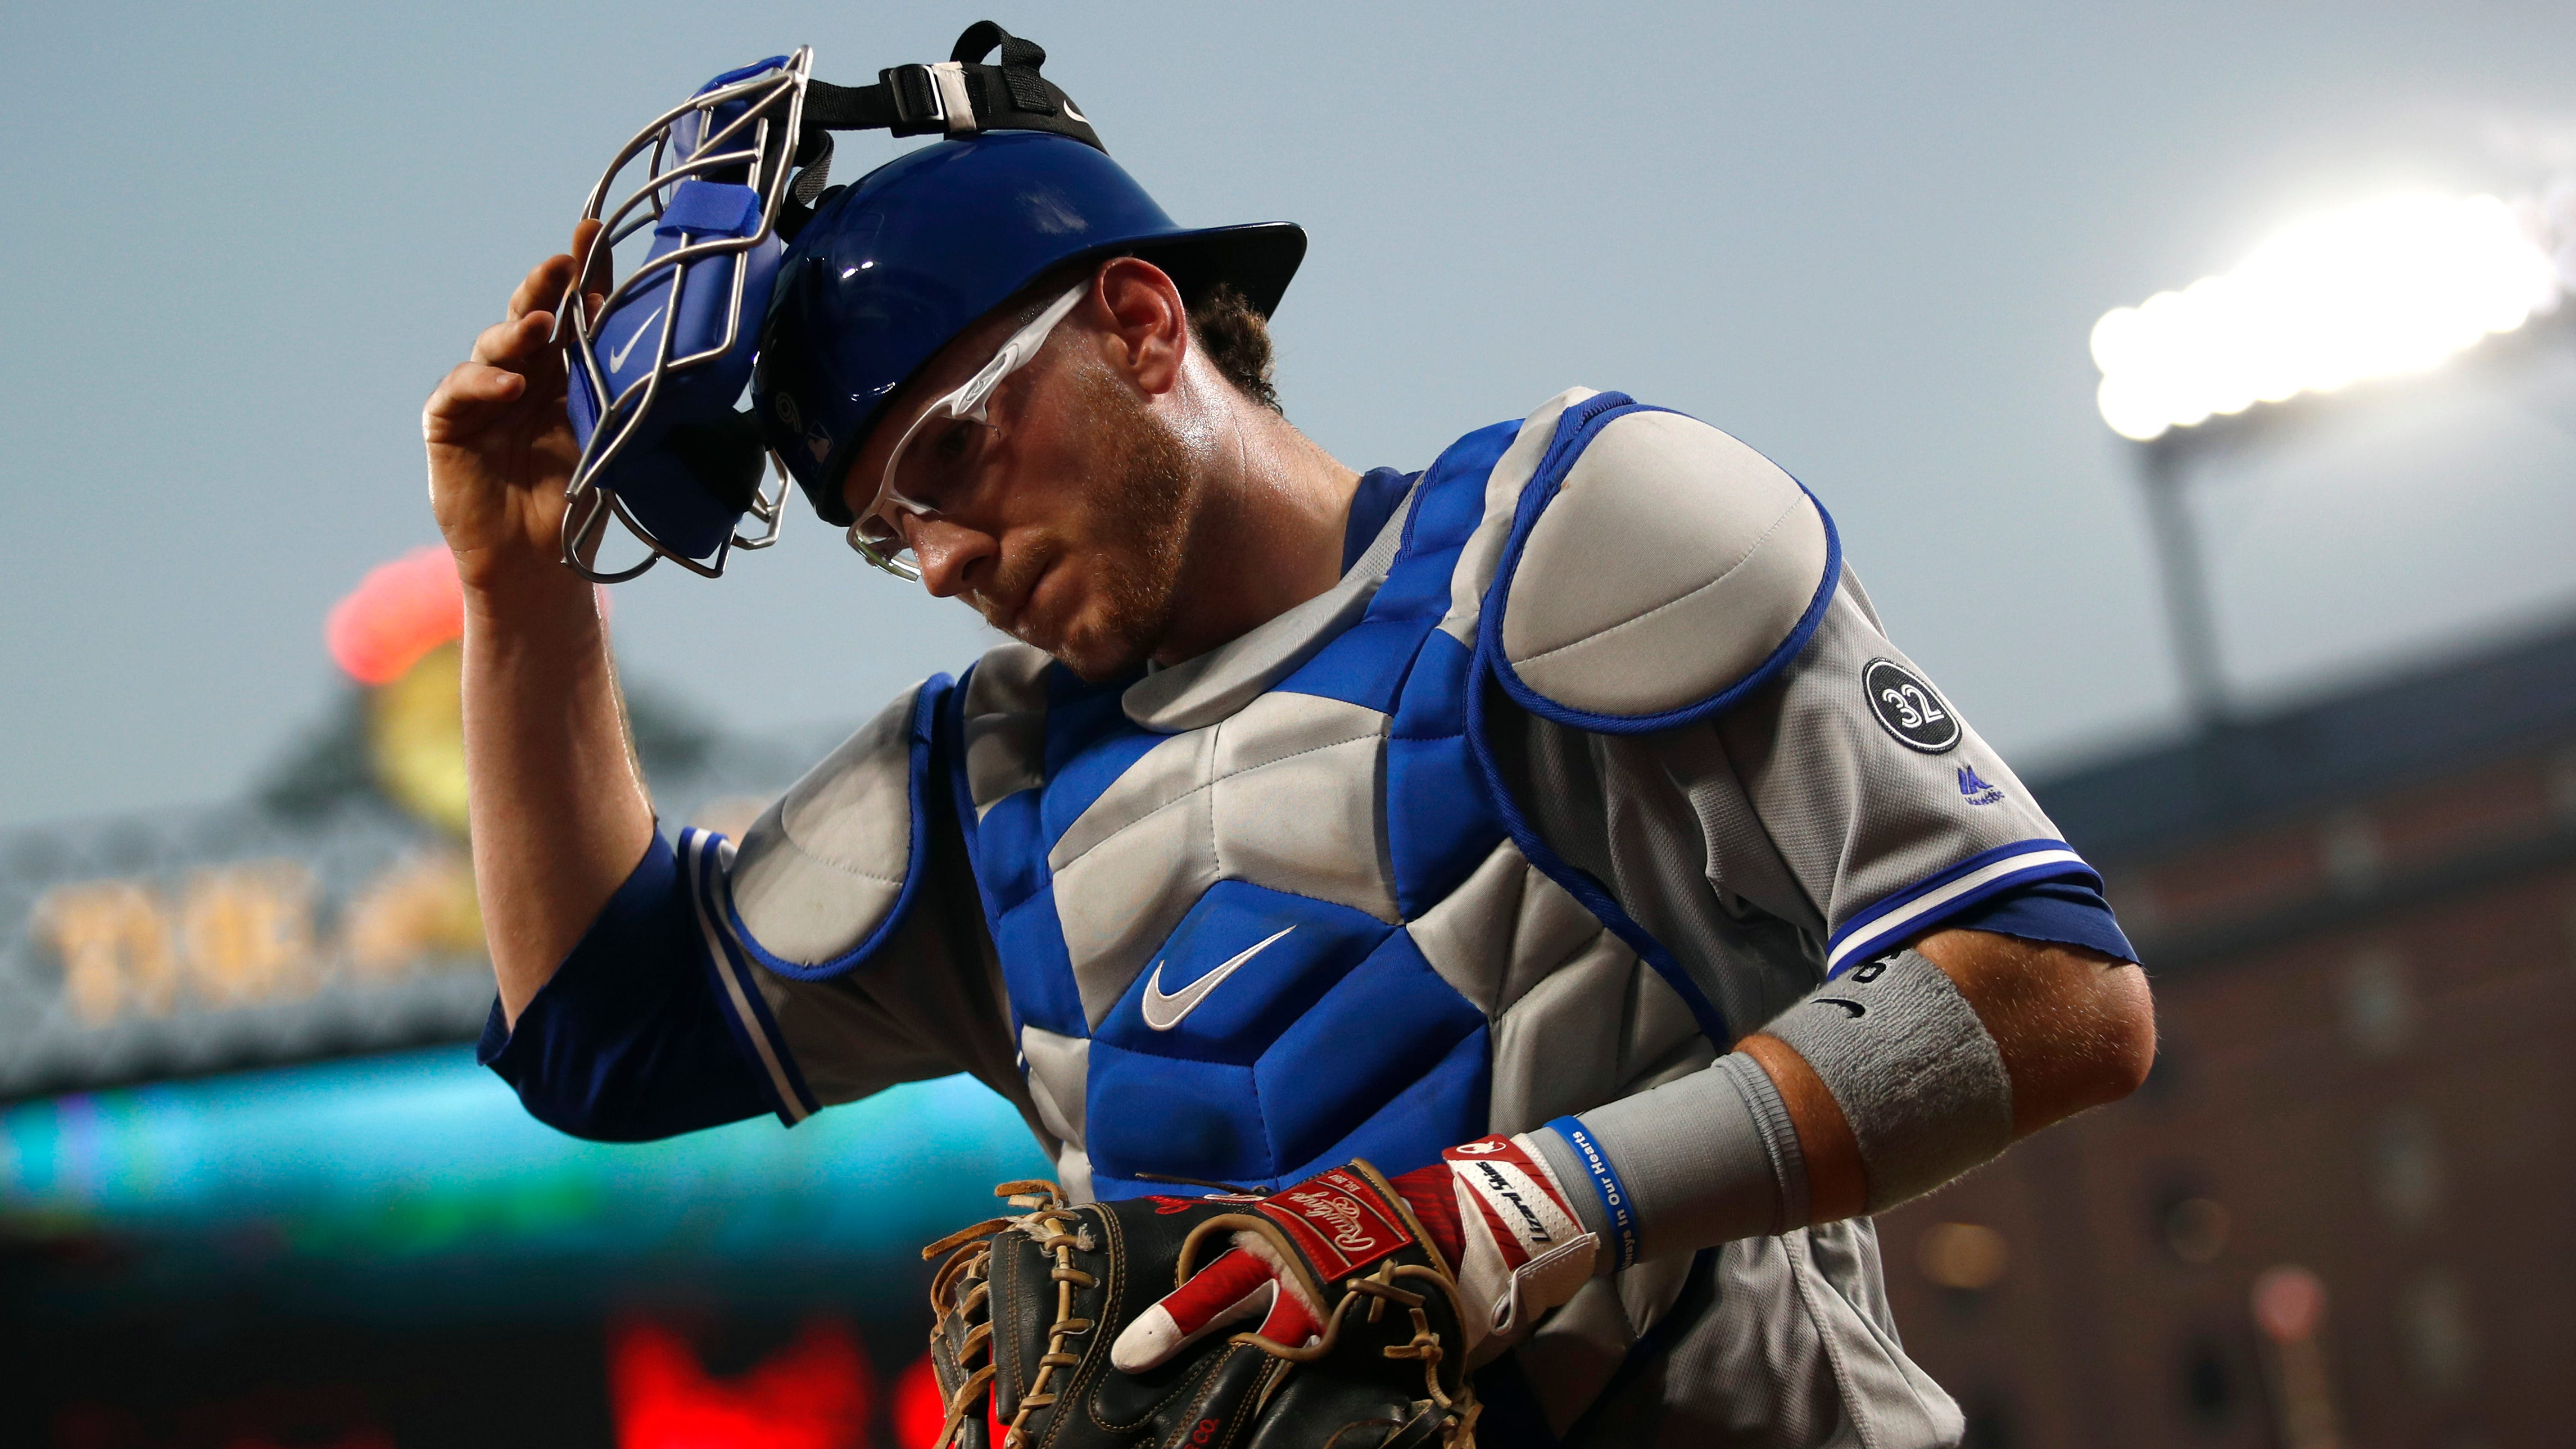 Photos: Danny Jansen's first trip through the major leagues